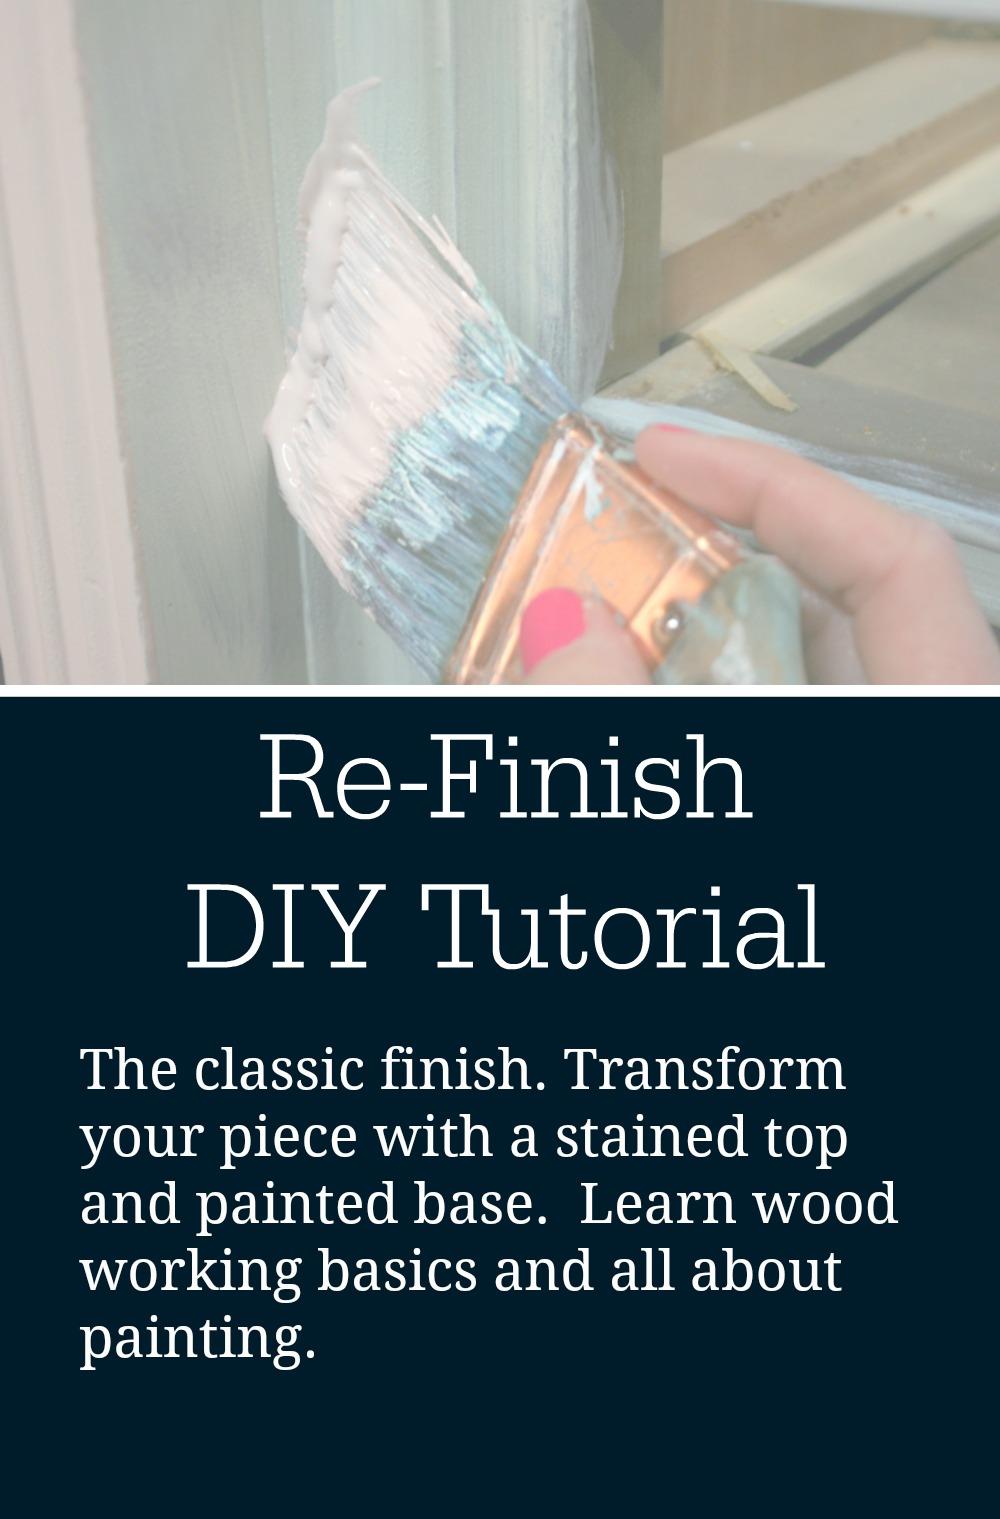 refinish diy tutorial class